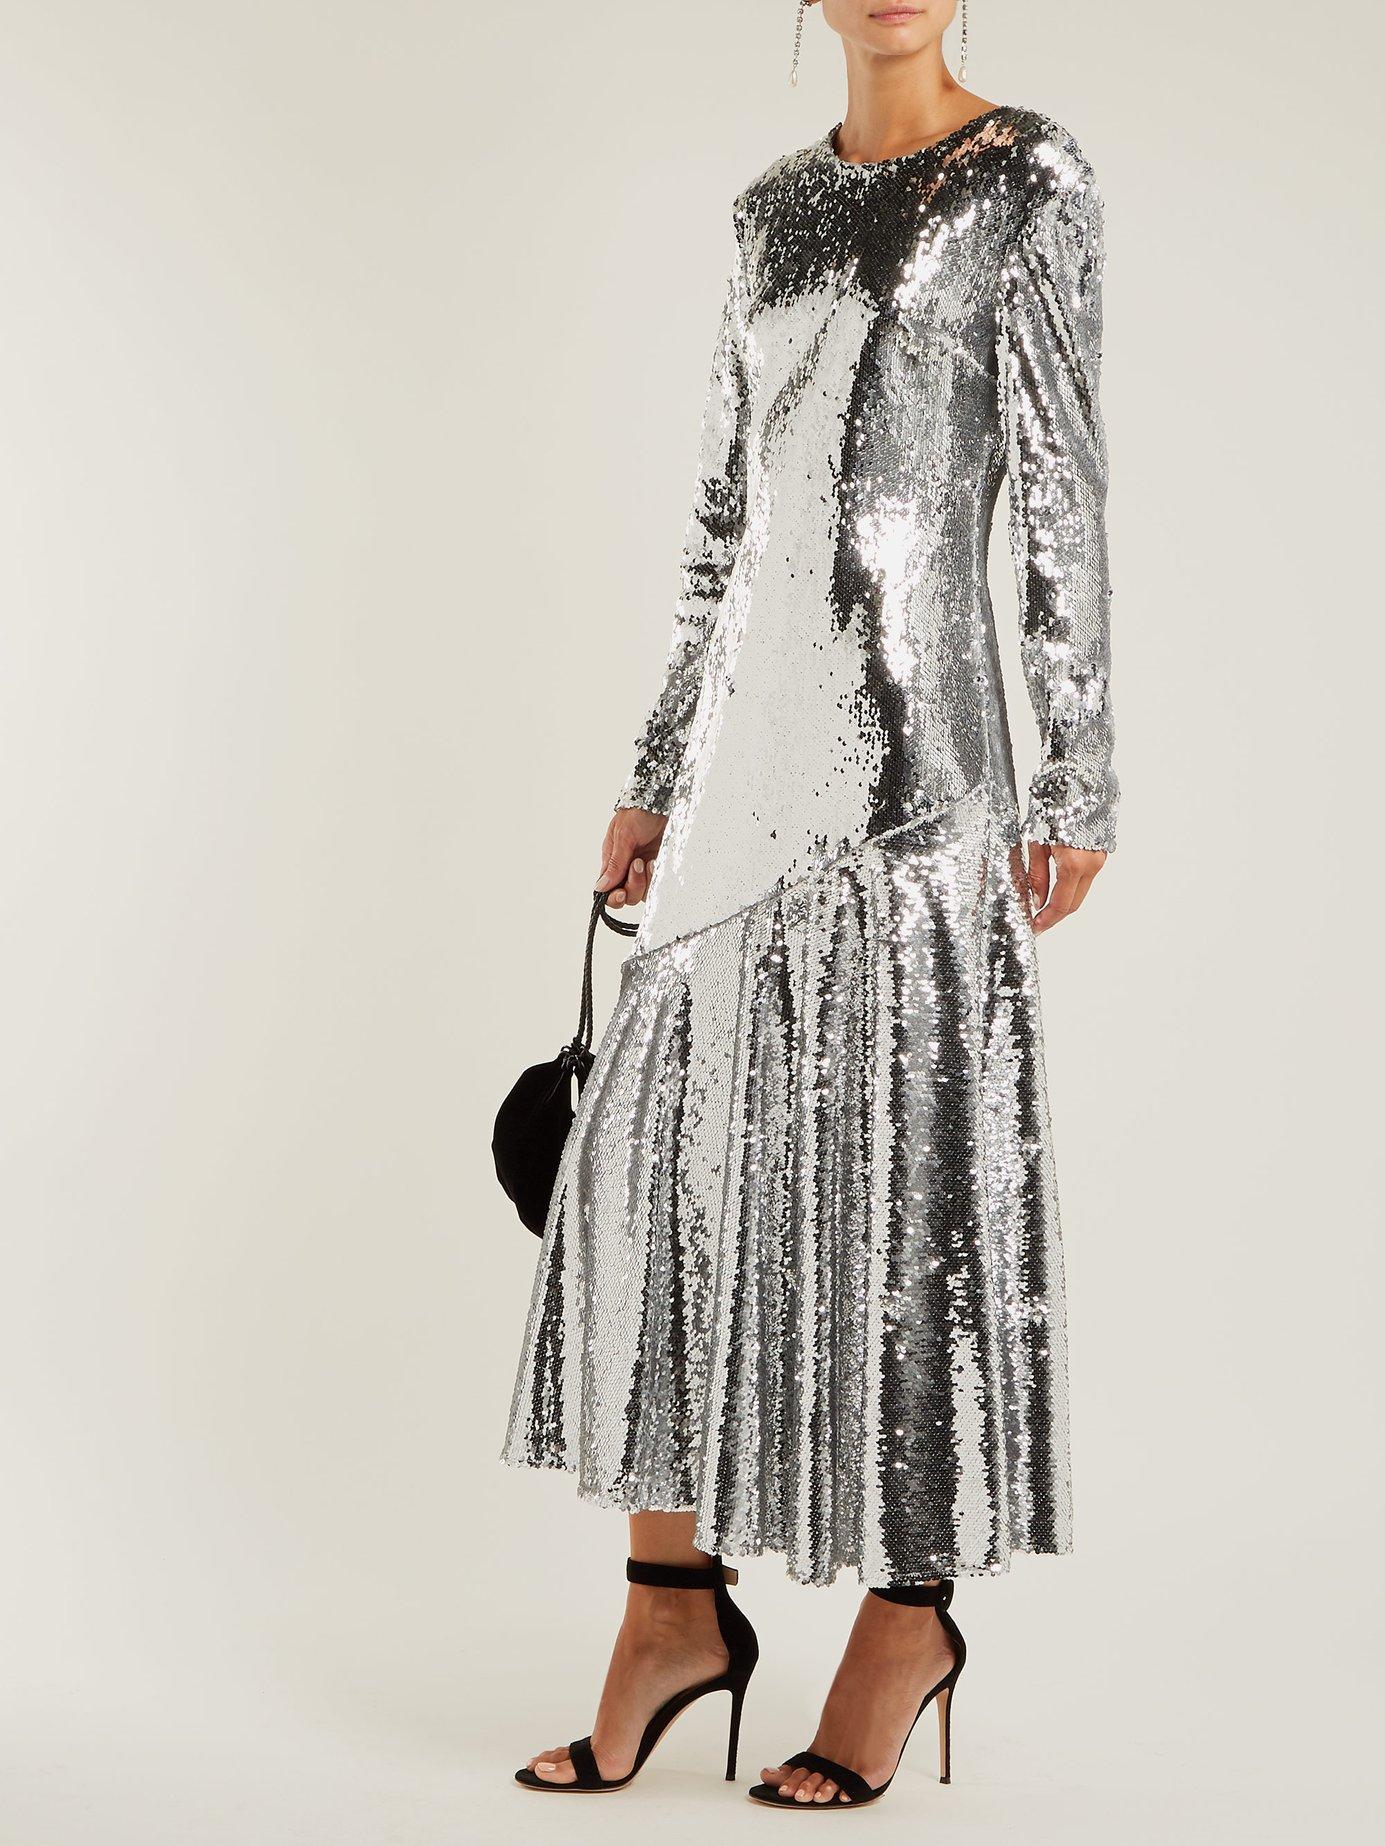 Gilda sequin-embellished dress by Racil